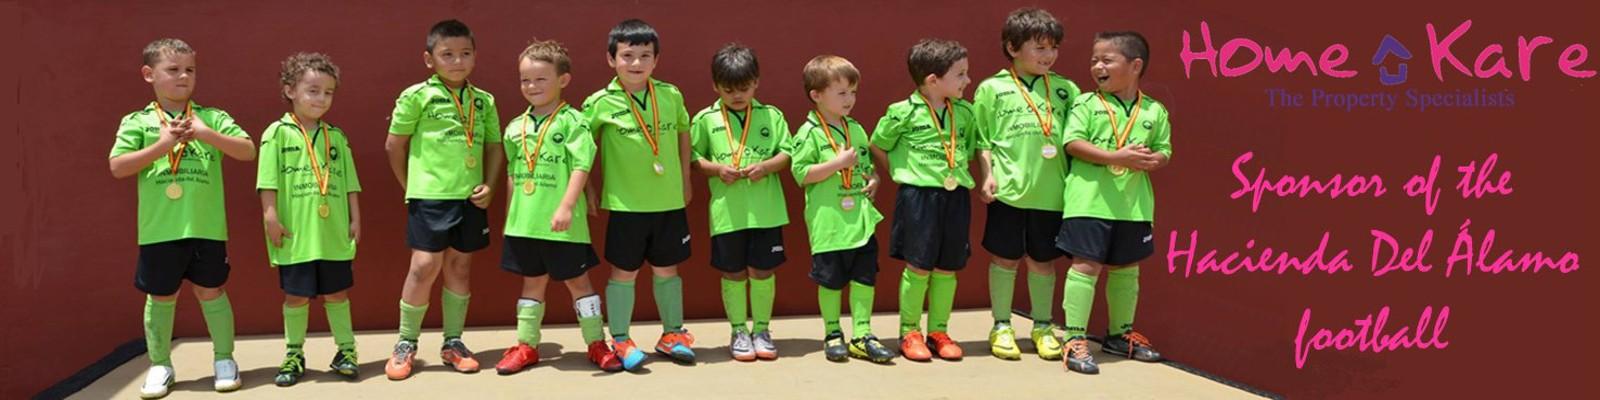 HOME KARE sponsor of the football school of HDA